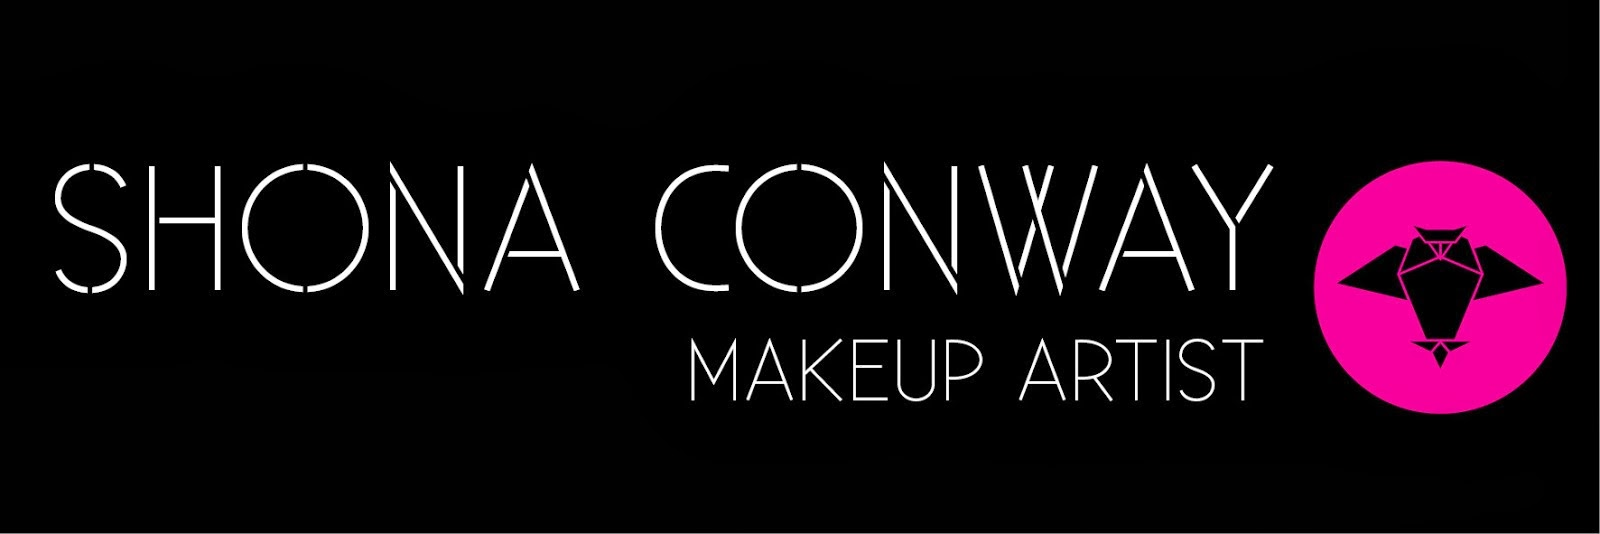 Shona Conway MakeUp